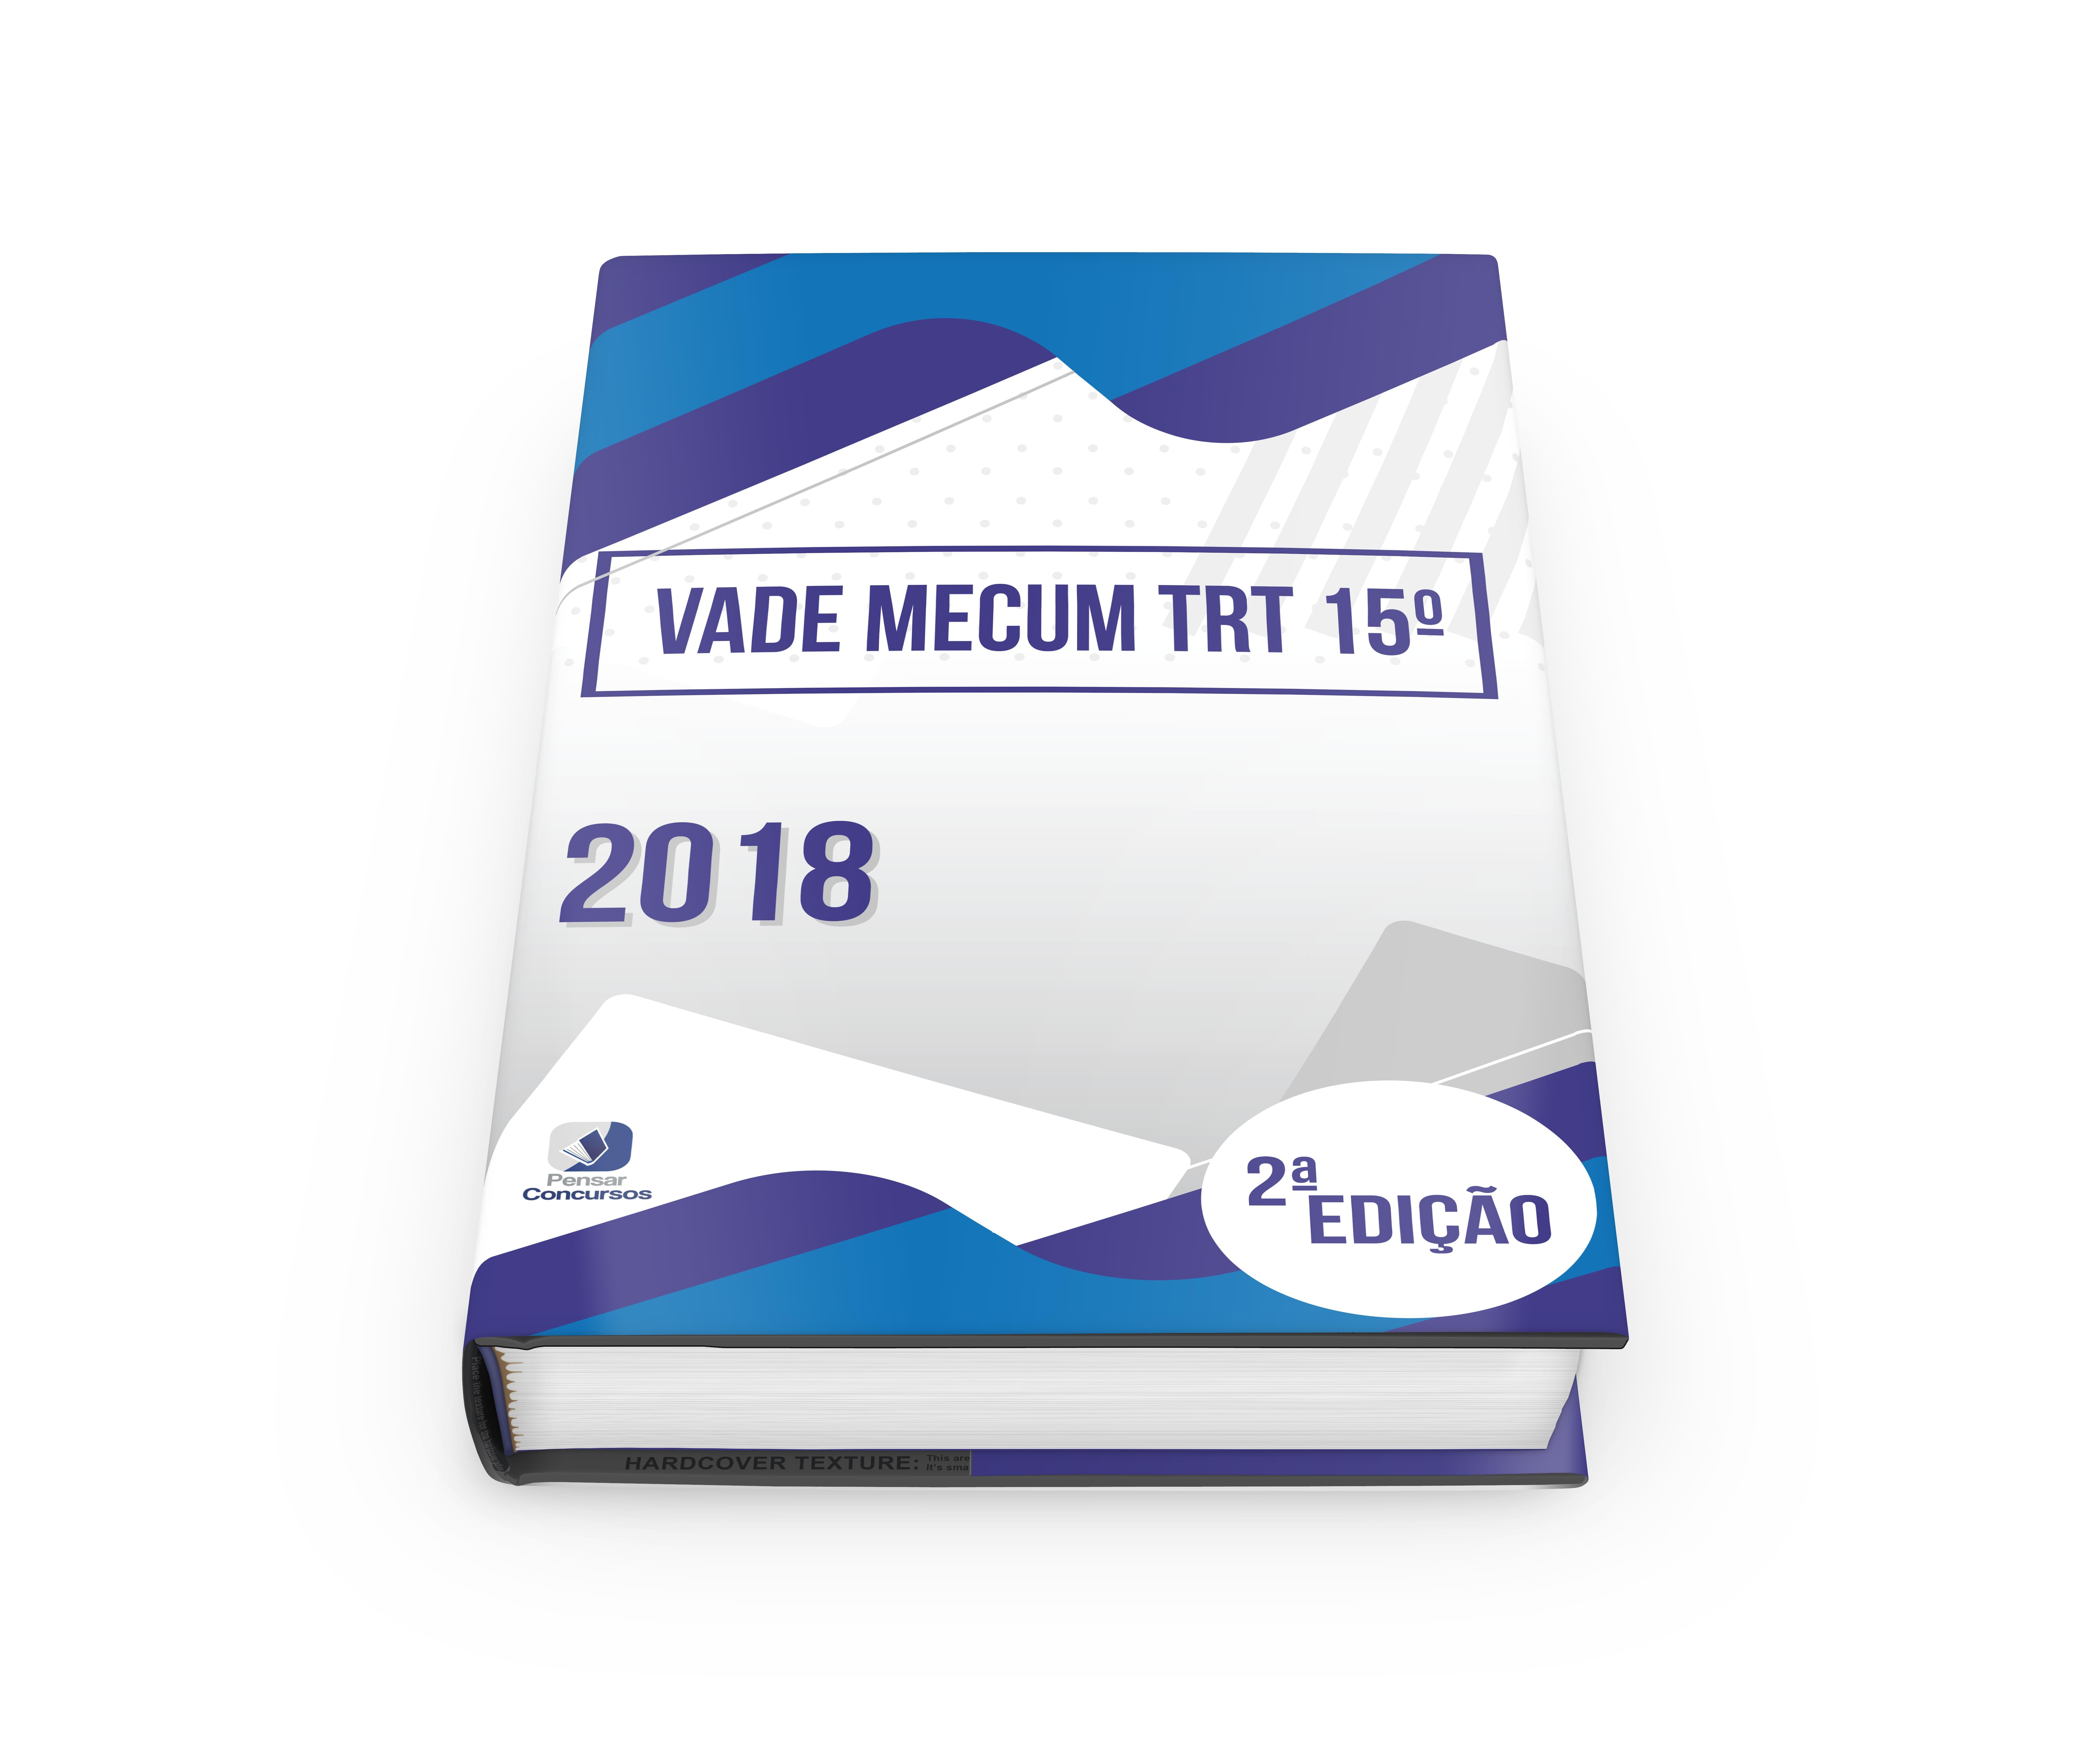 VADE MECUM TRT 15º - AJAA